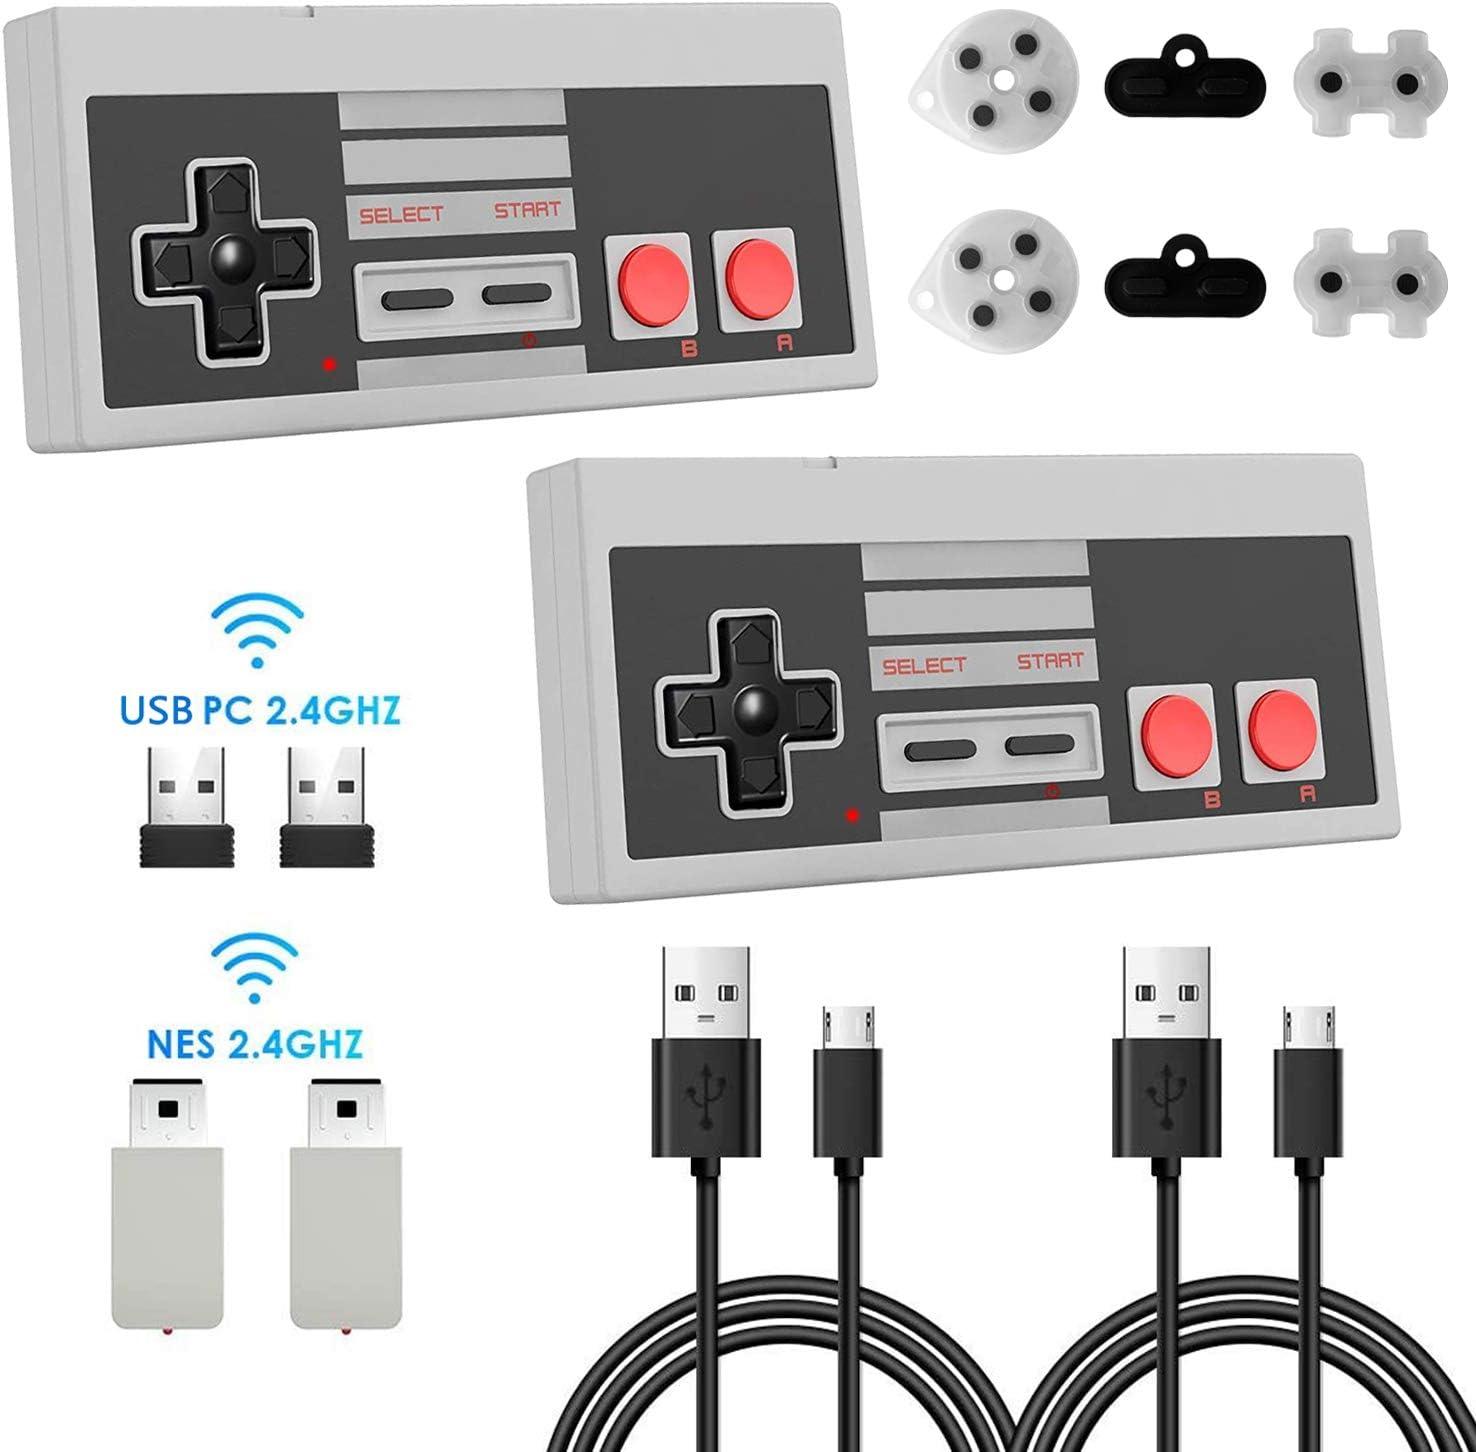 Free Amazon Promo Code 2020 for NES Mini Wireless Controller